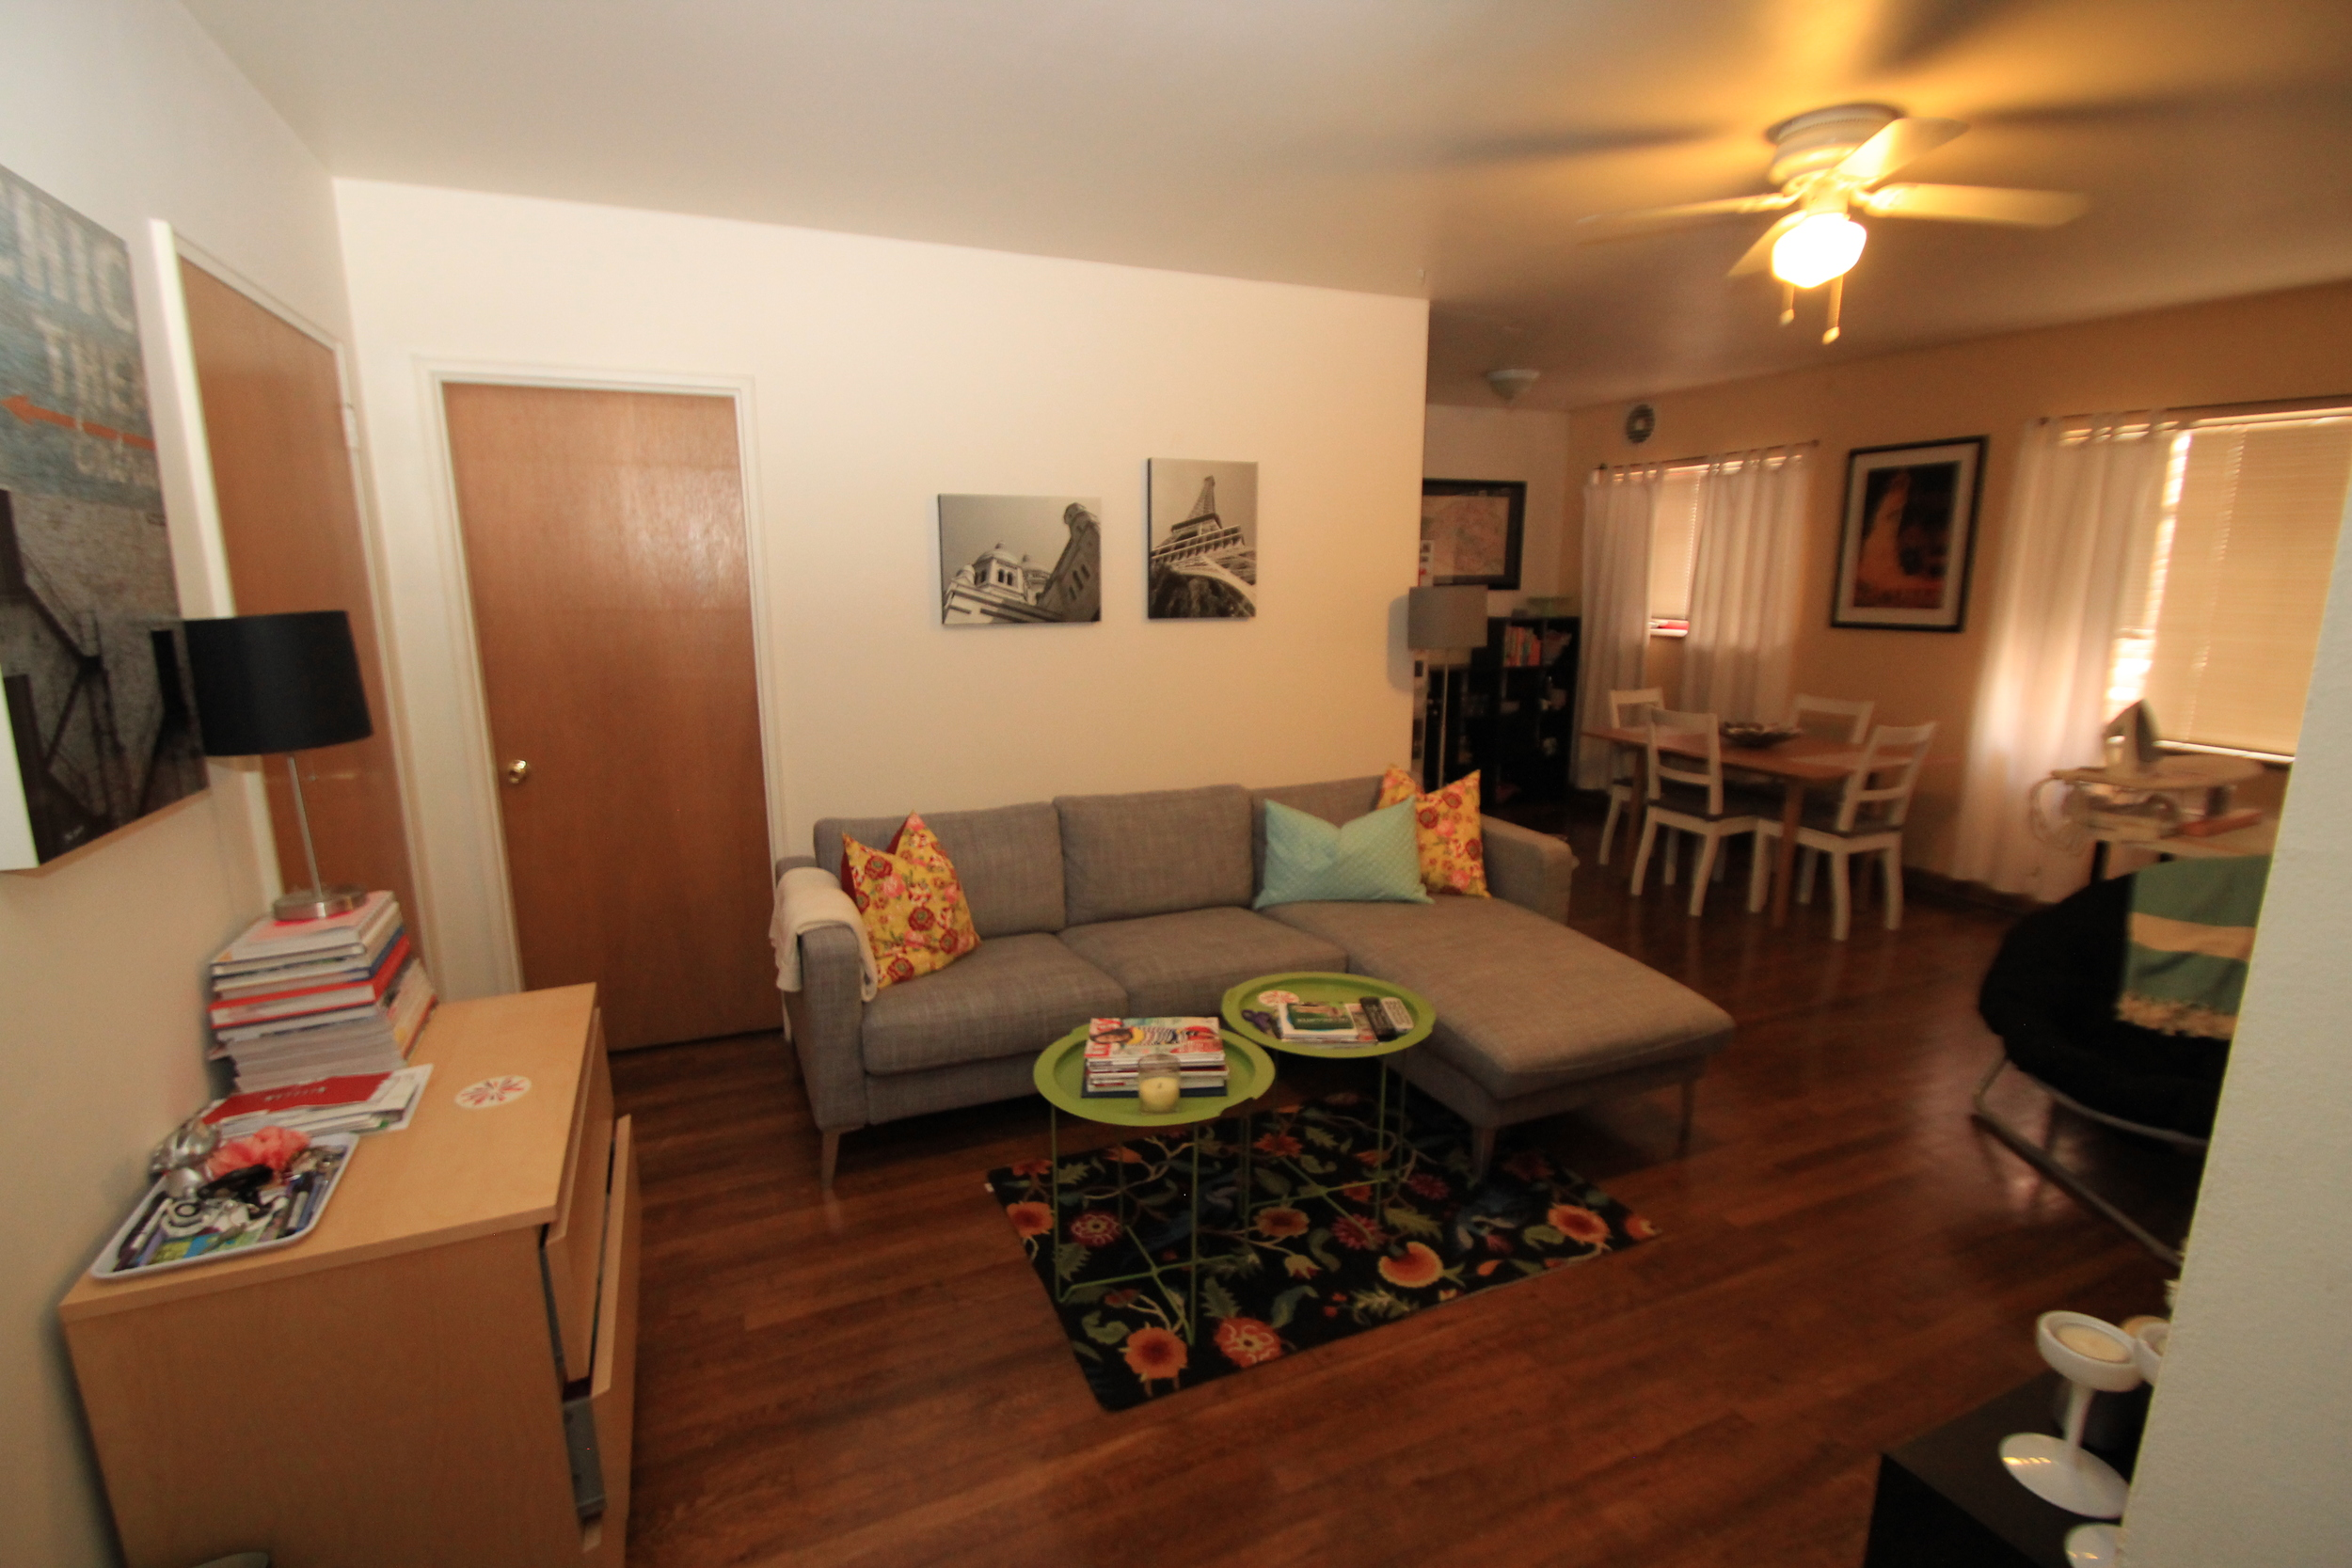 sj one bedroom living room 2.JPG